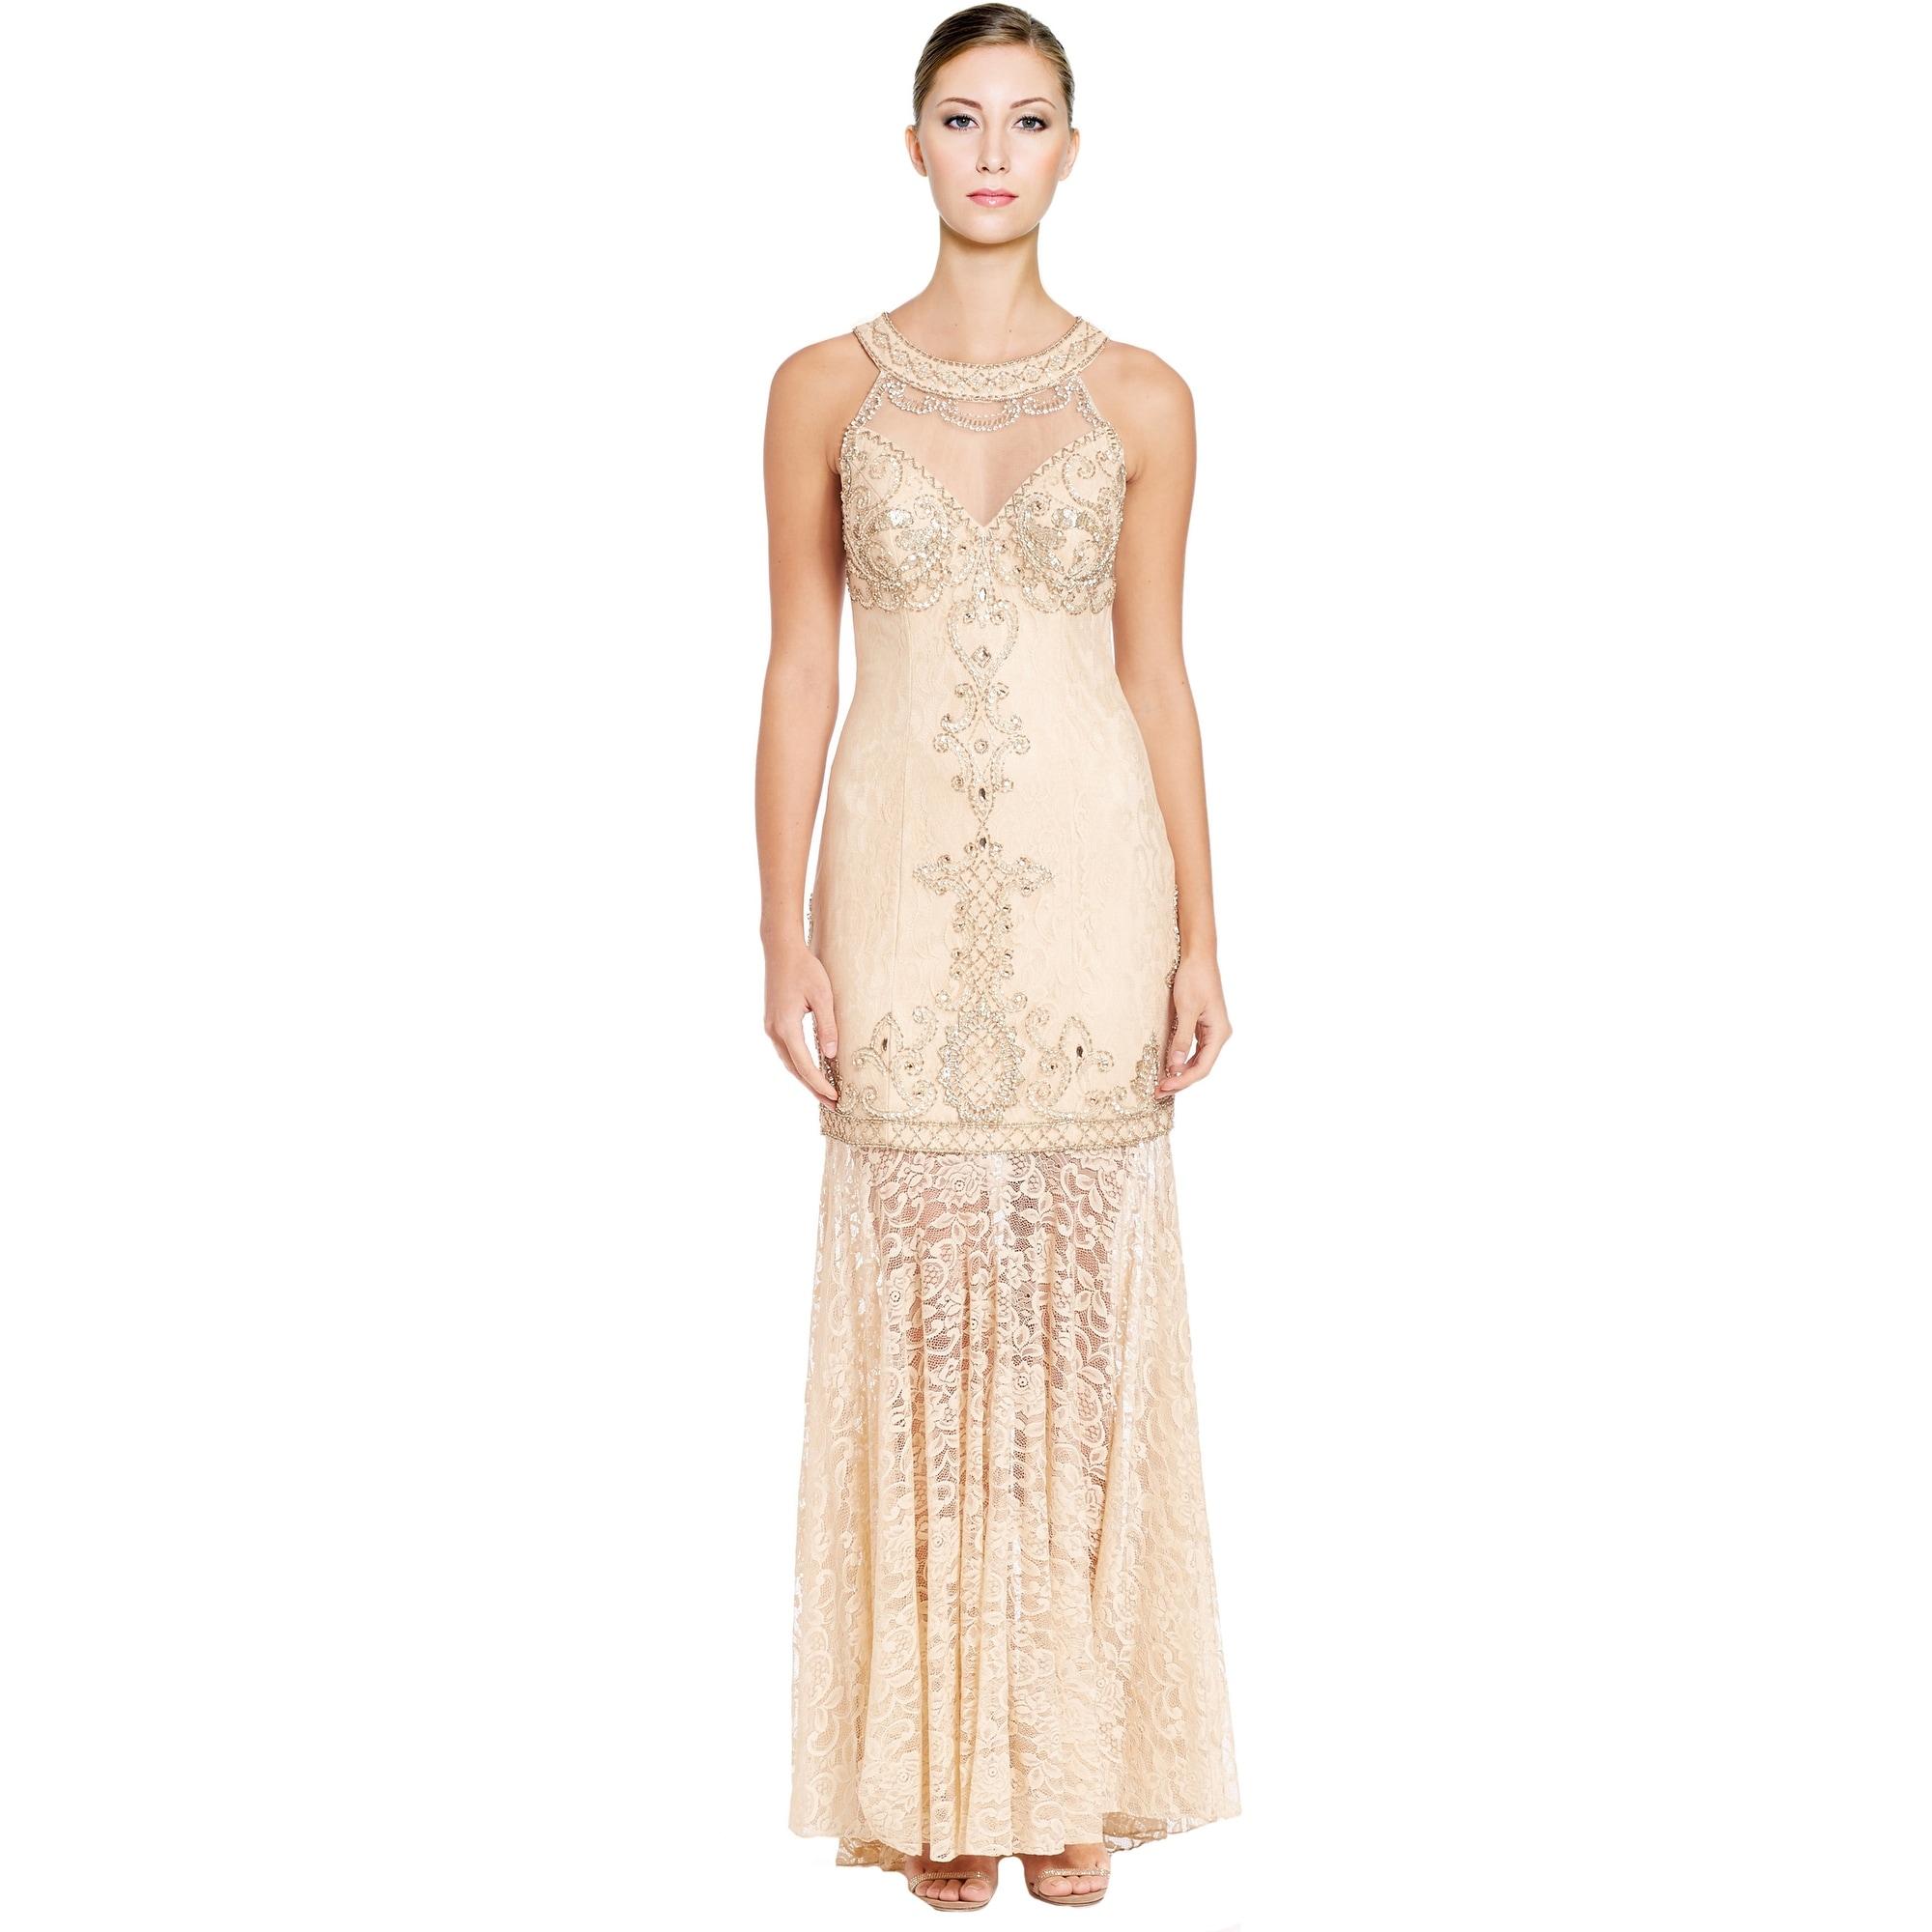 Sue Wong Embellished Lace Illusion Yoke Halter Evening Gown Dress ...